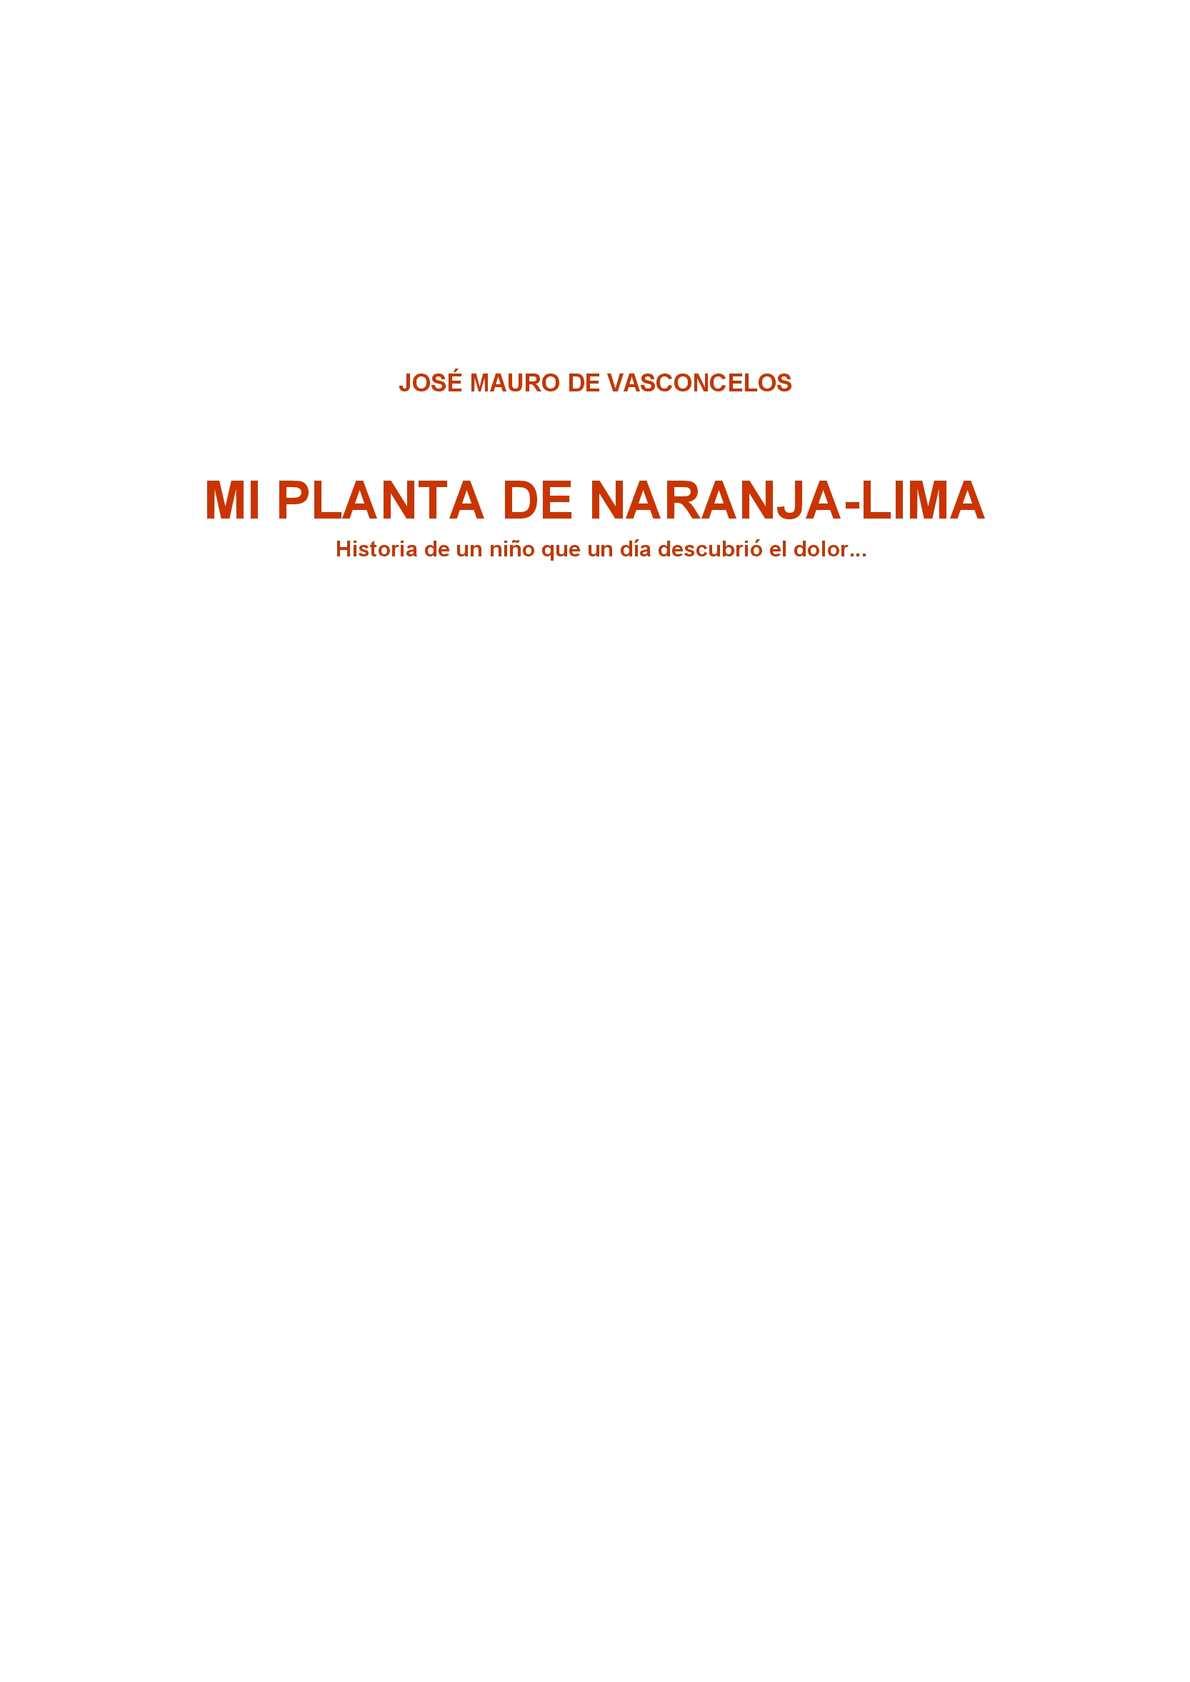 Calaméo - Mi planta de naranja lima 353e71bdbc868